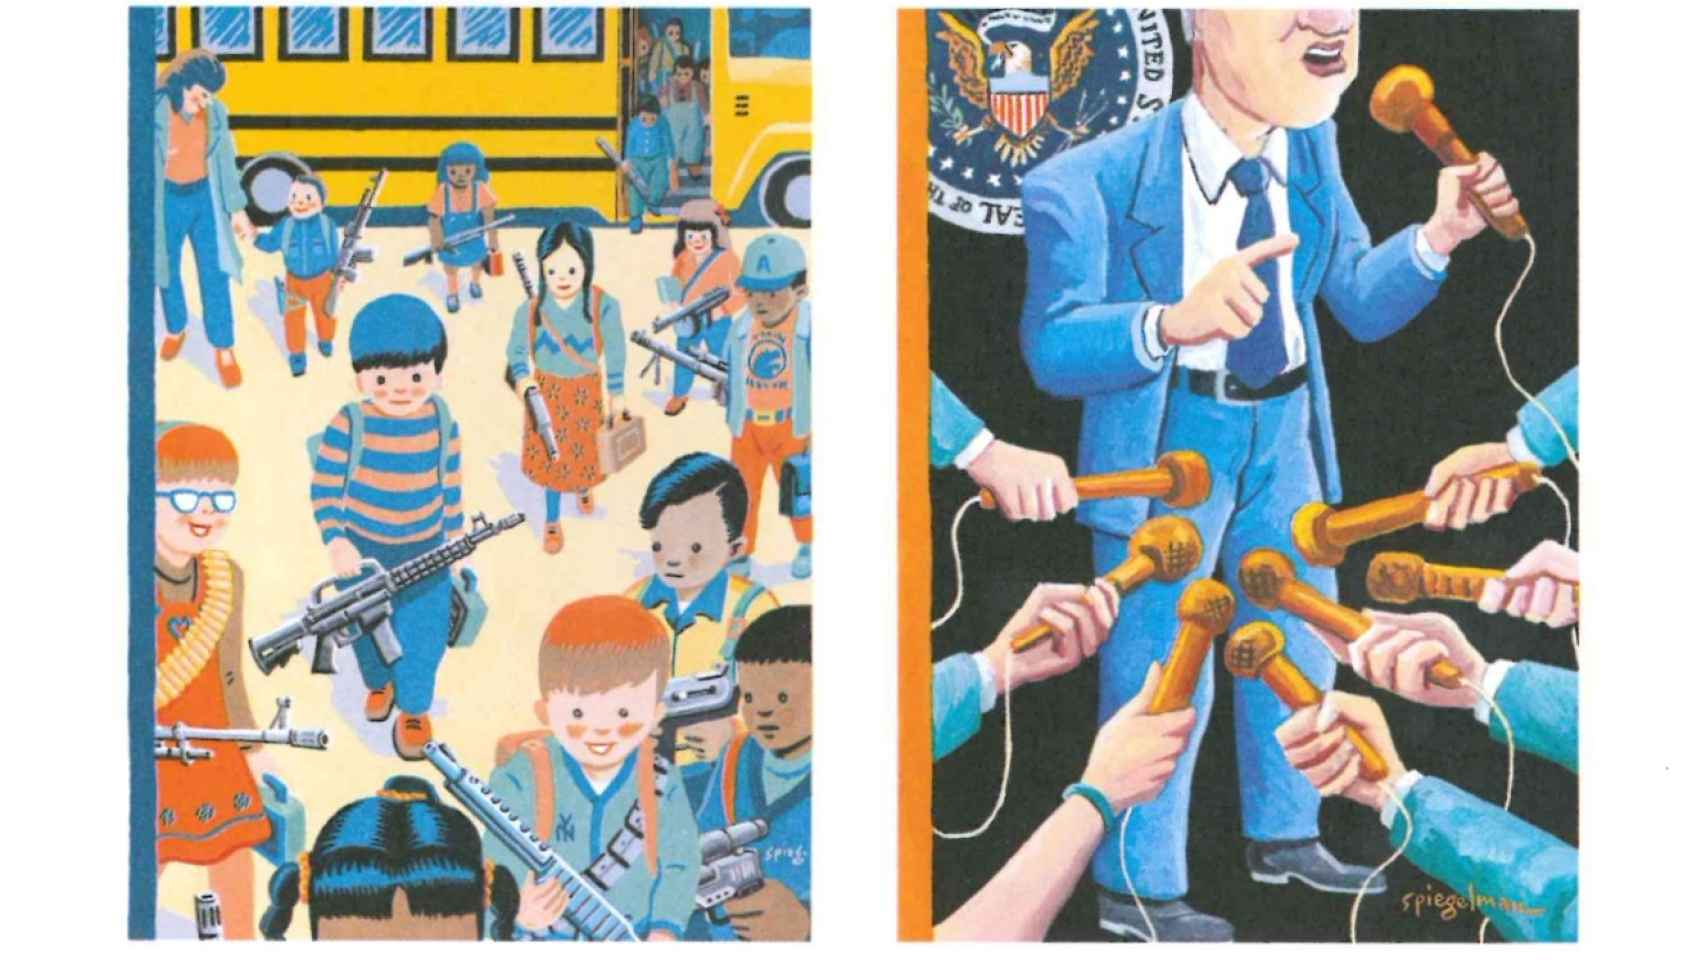 Dos portadas para The New Yorker, de 1993 y 1998 respectivamente